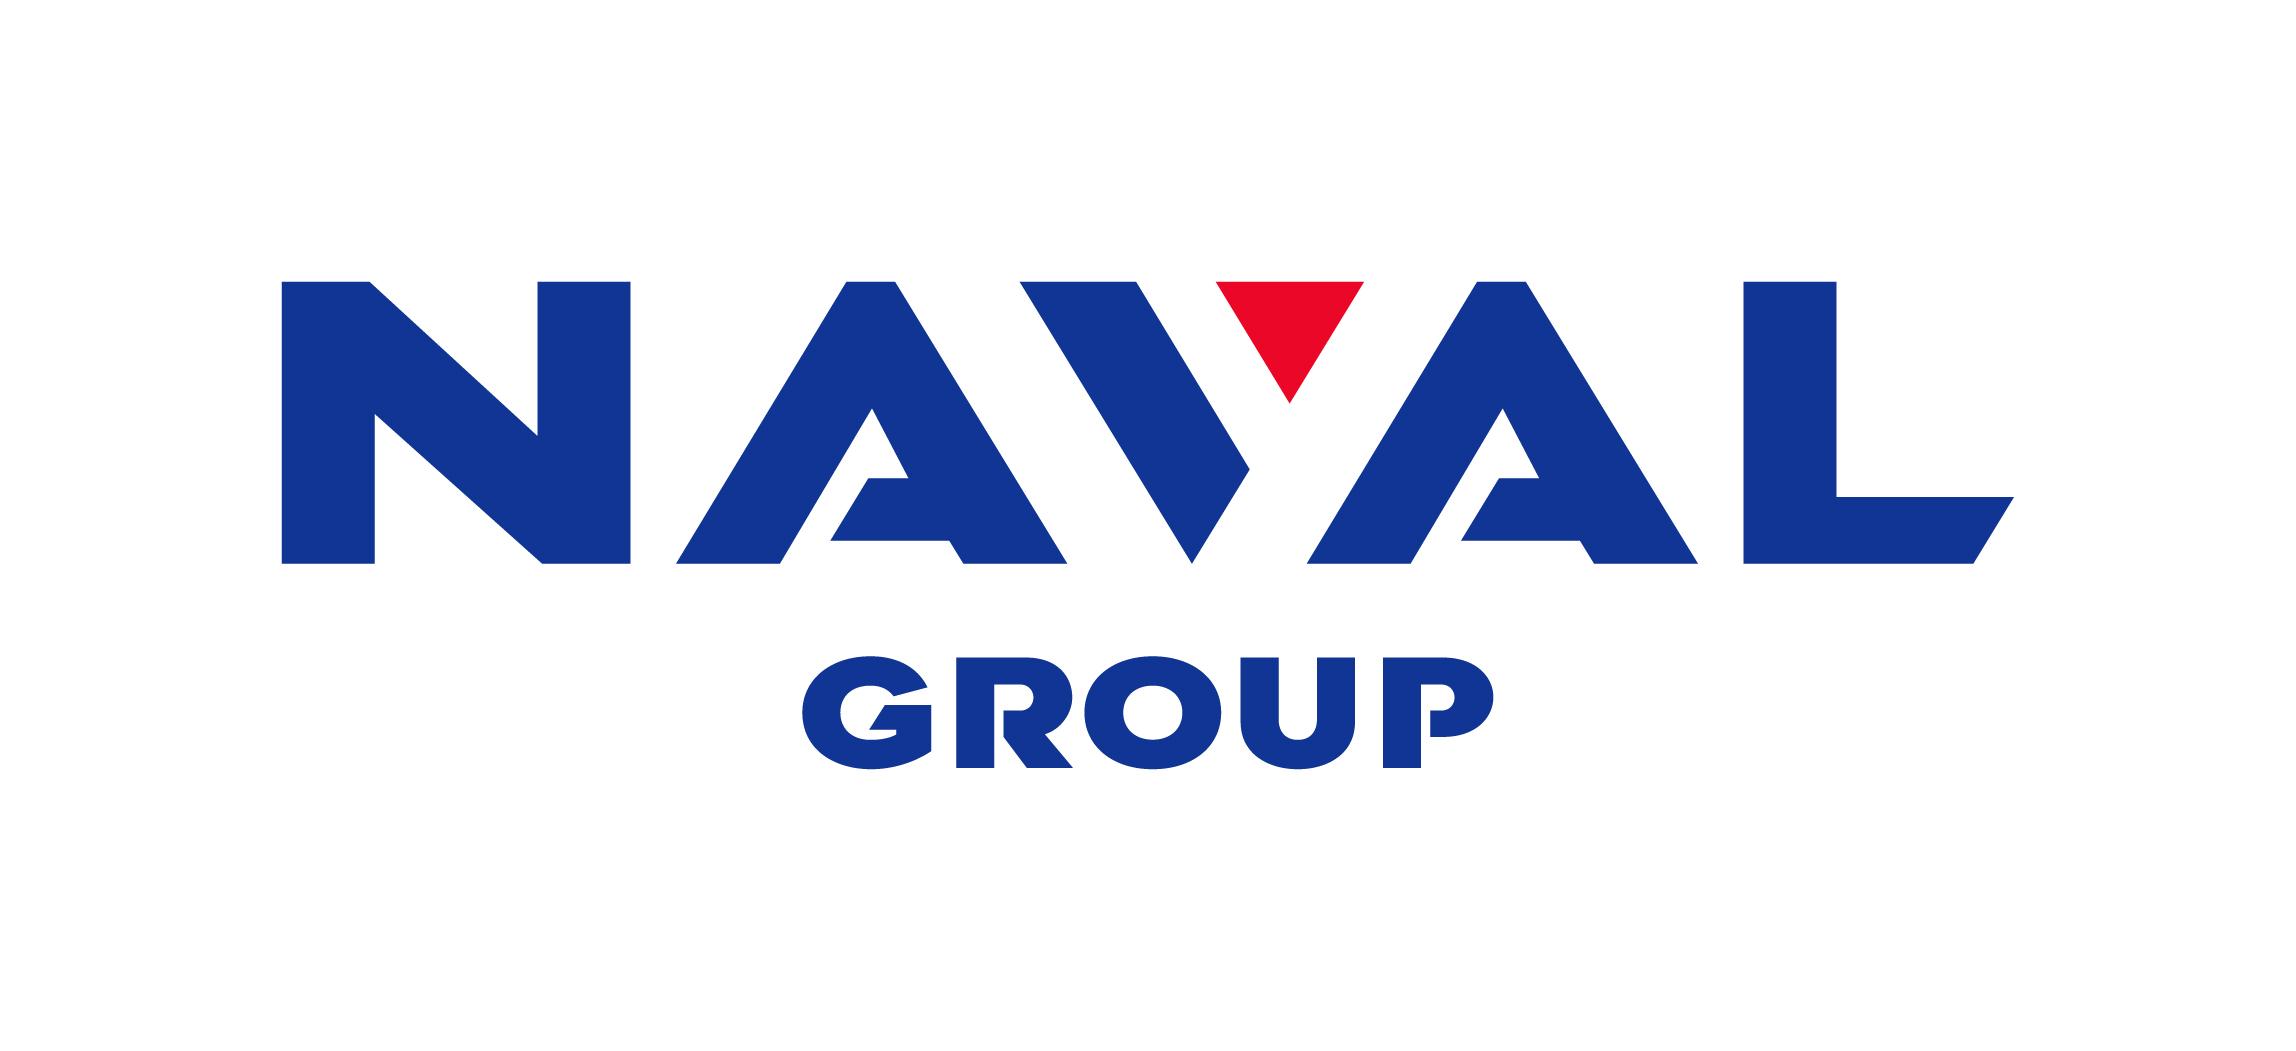 dcns-naval-group-herve-guillou.jpg